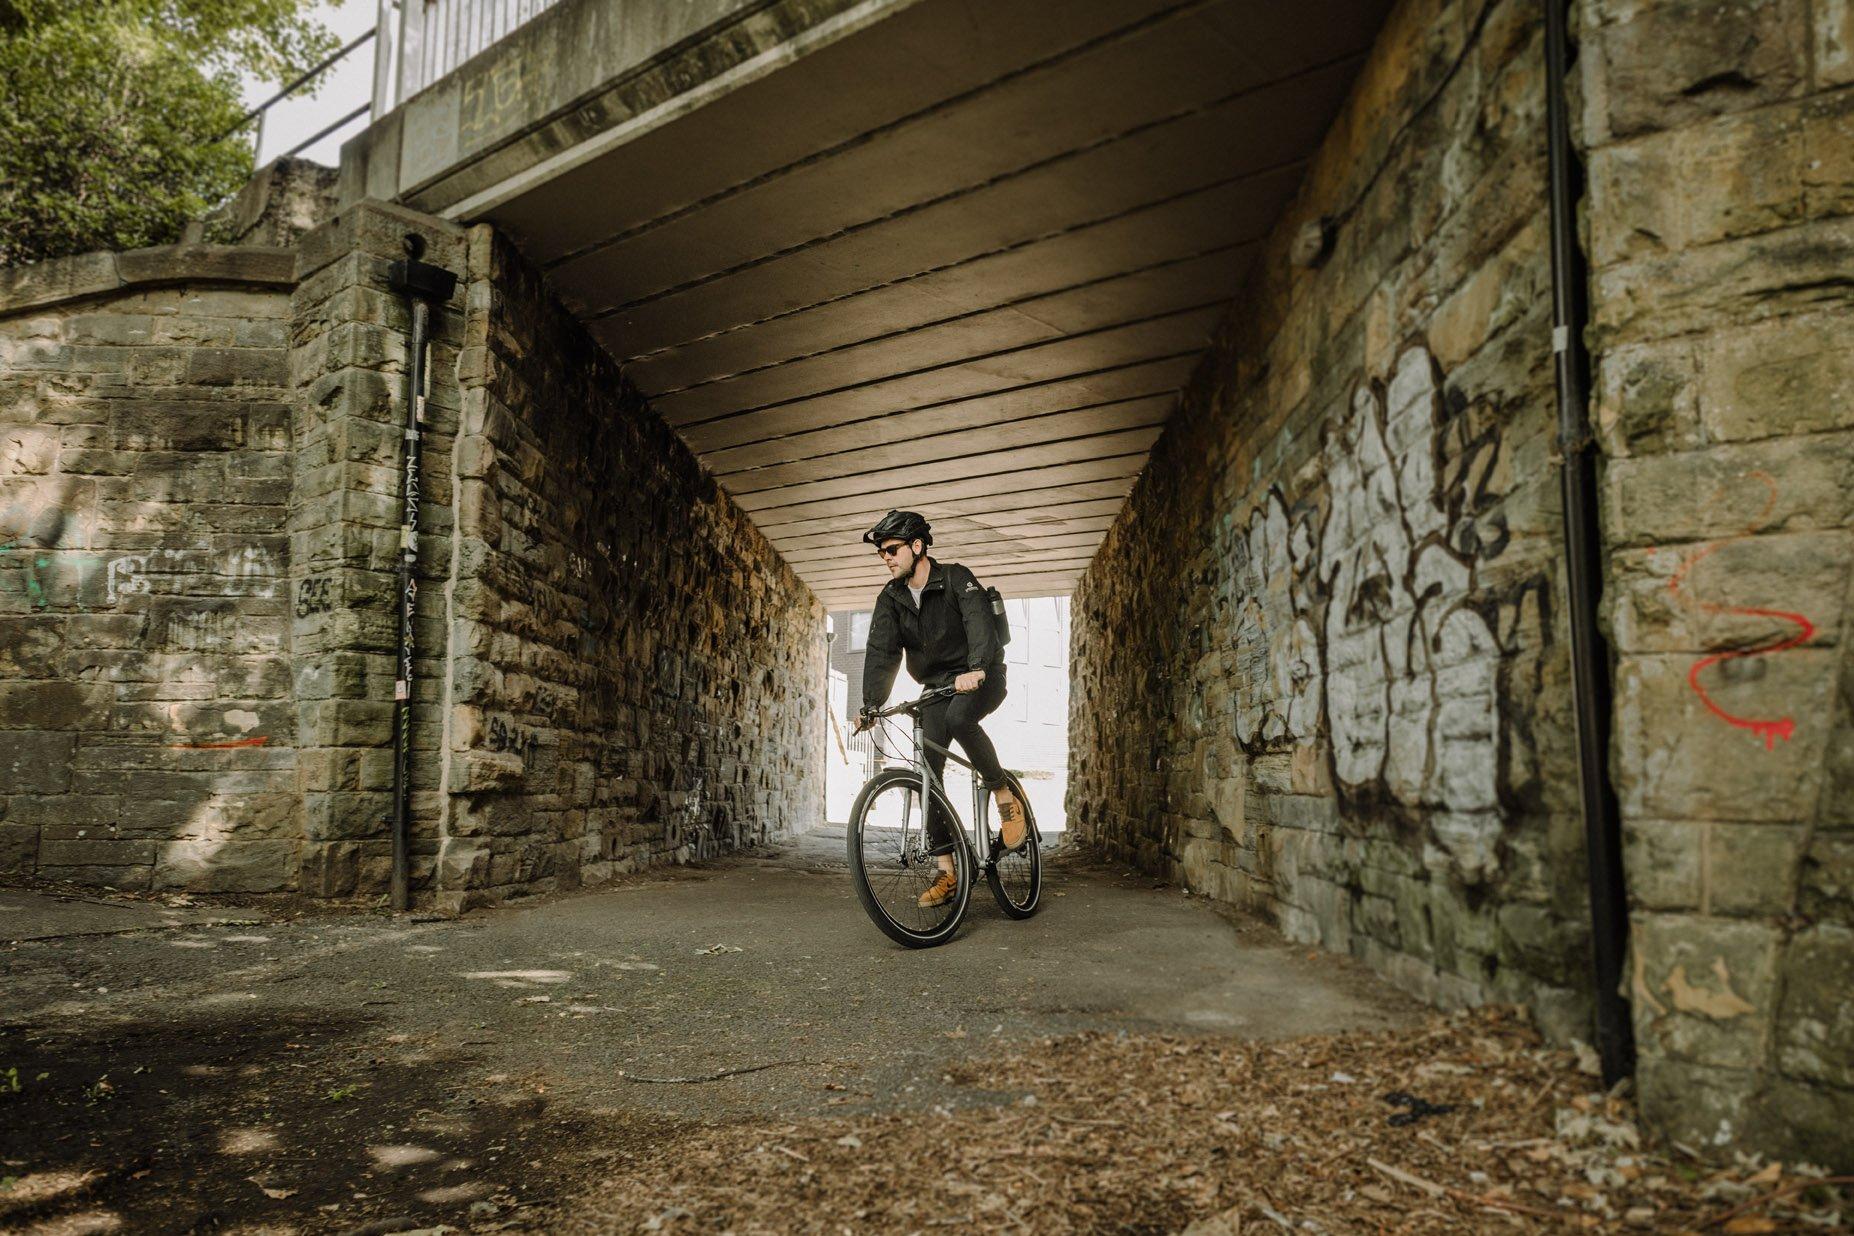 Commutor cyclist riding under bridge